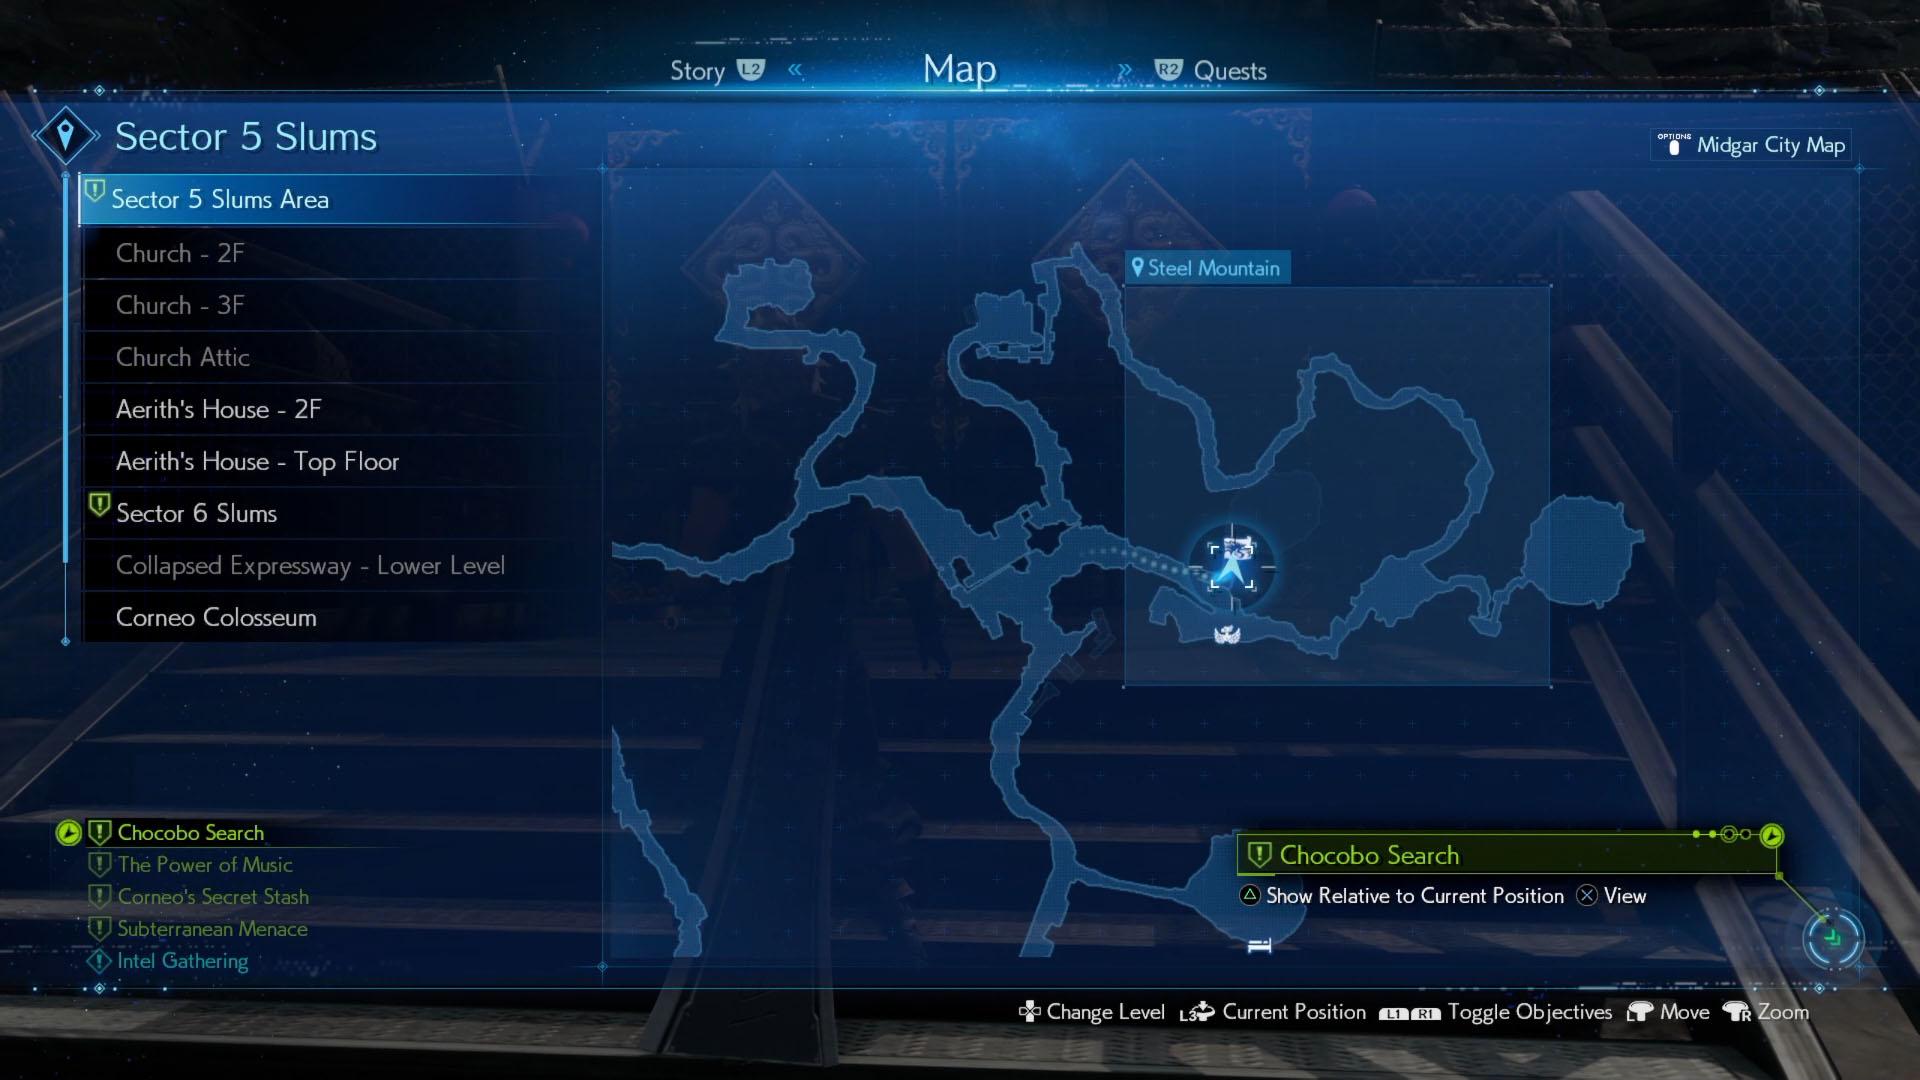 Corneo Secret Stash location - Steel Mountain - Final Fantasy 7 Remake